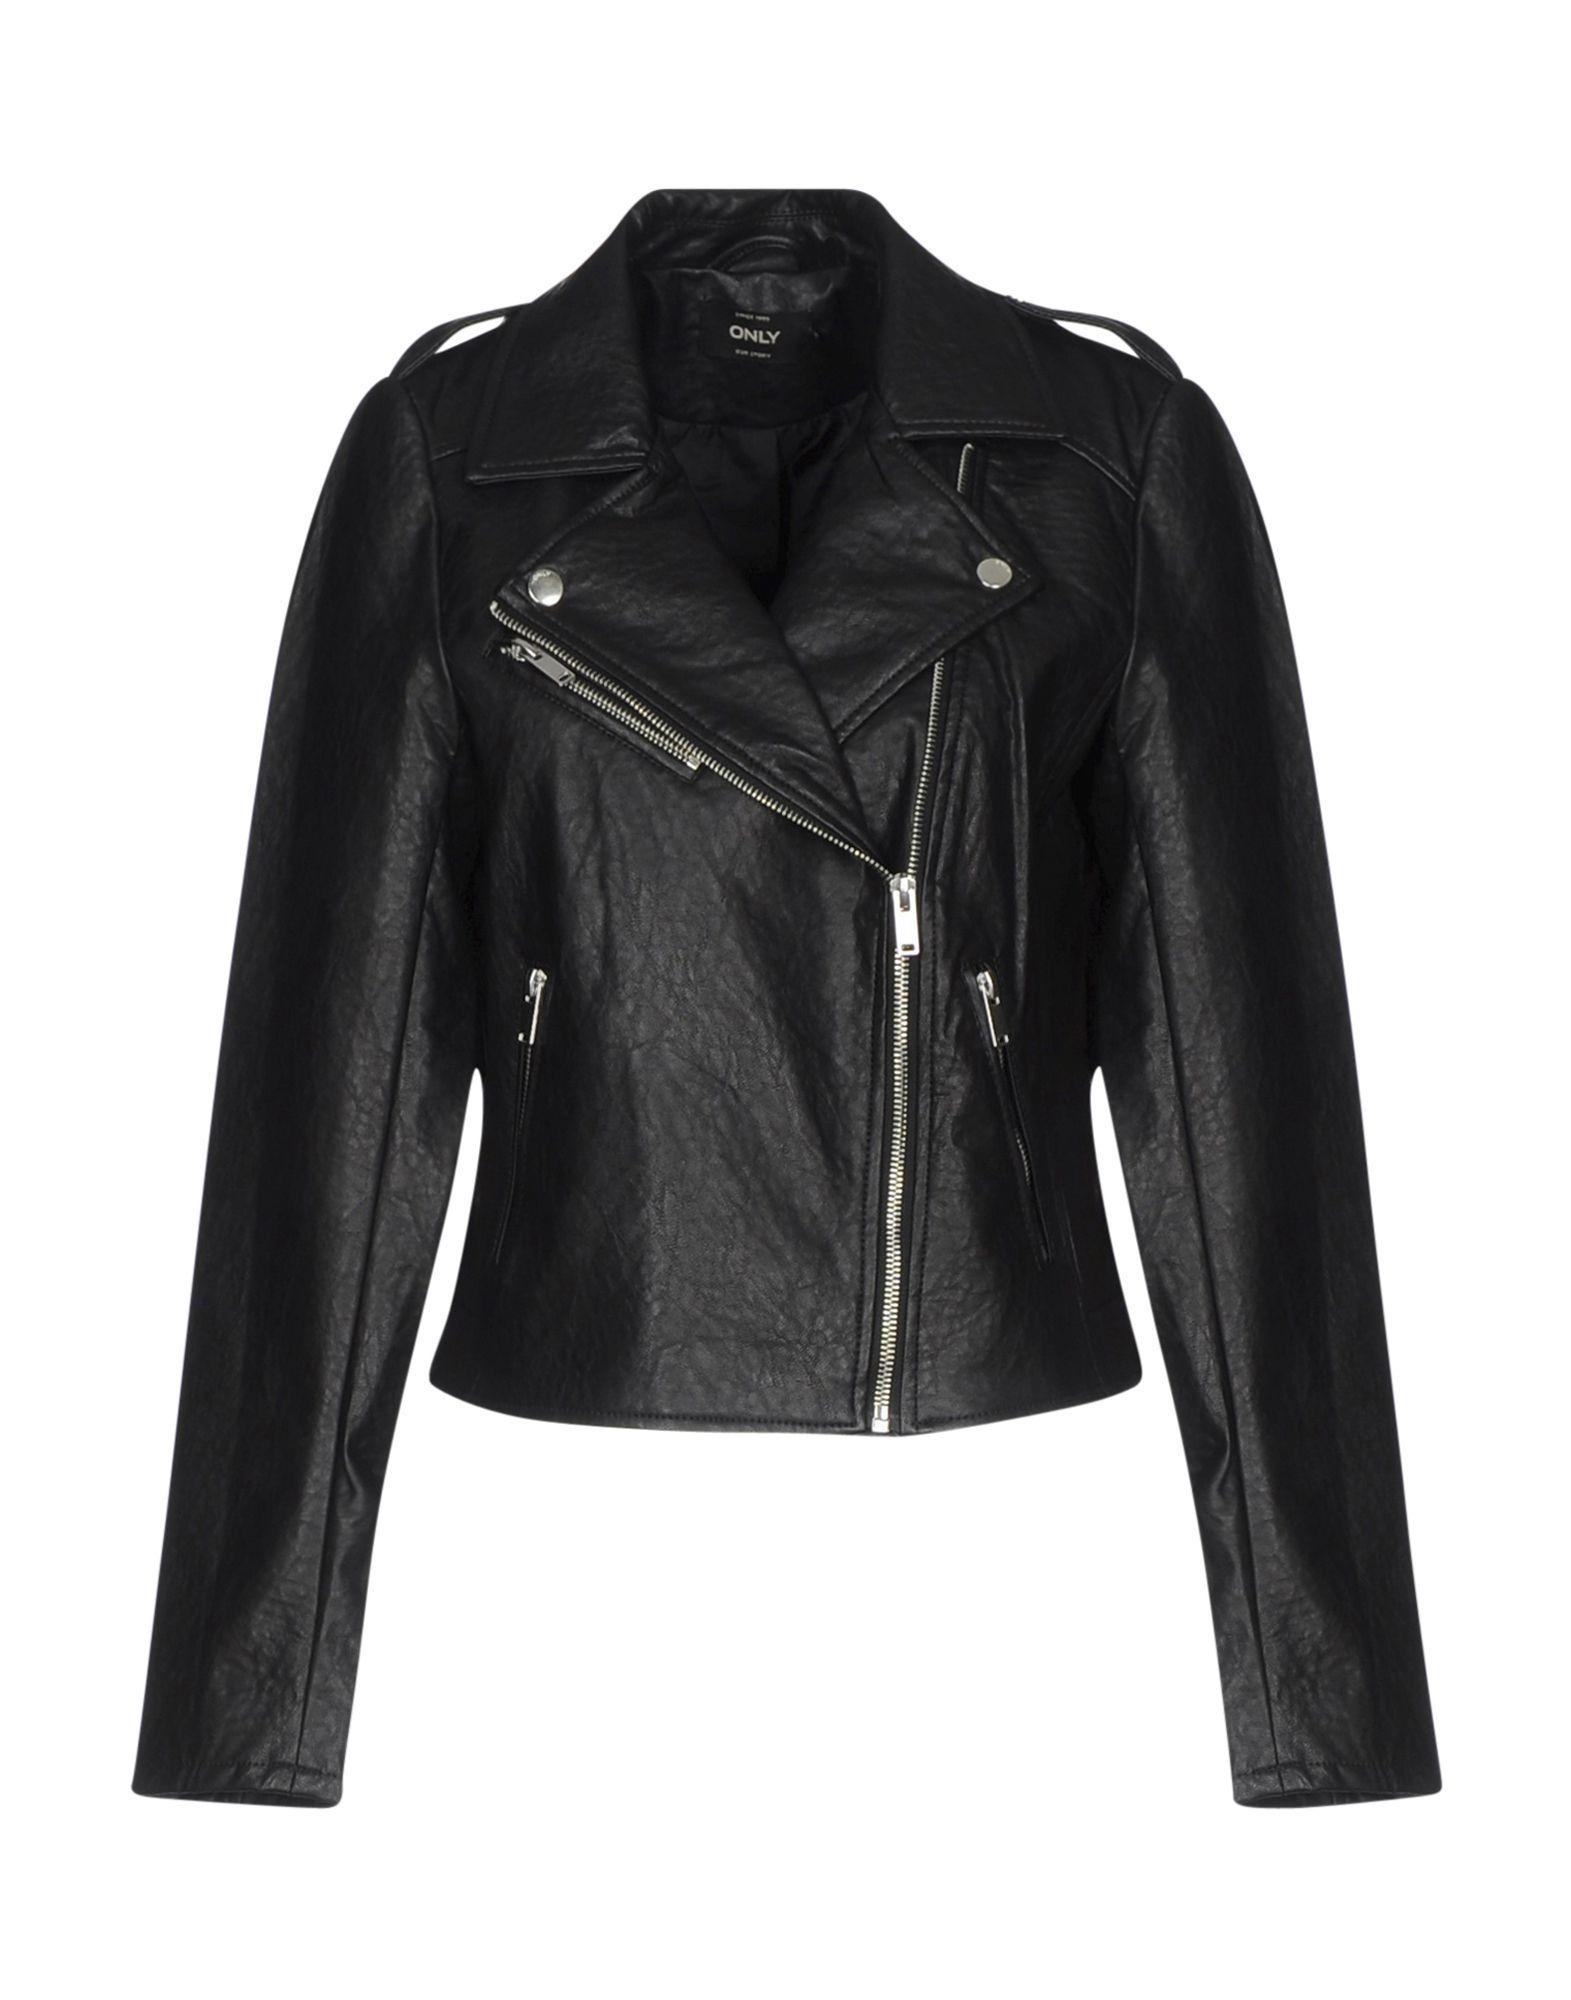 Only Black Faux Leather Biker Jacket